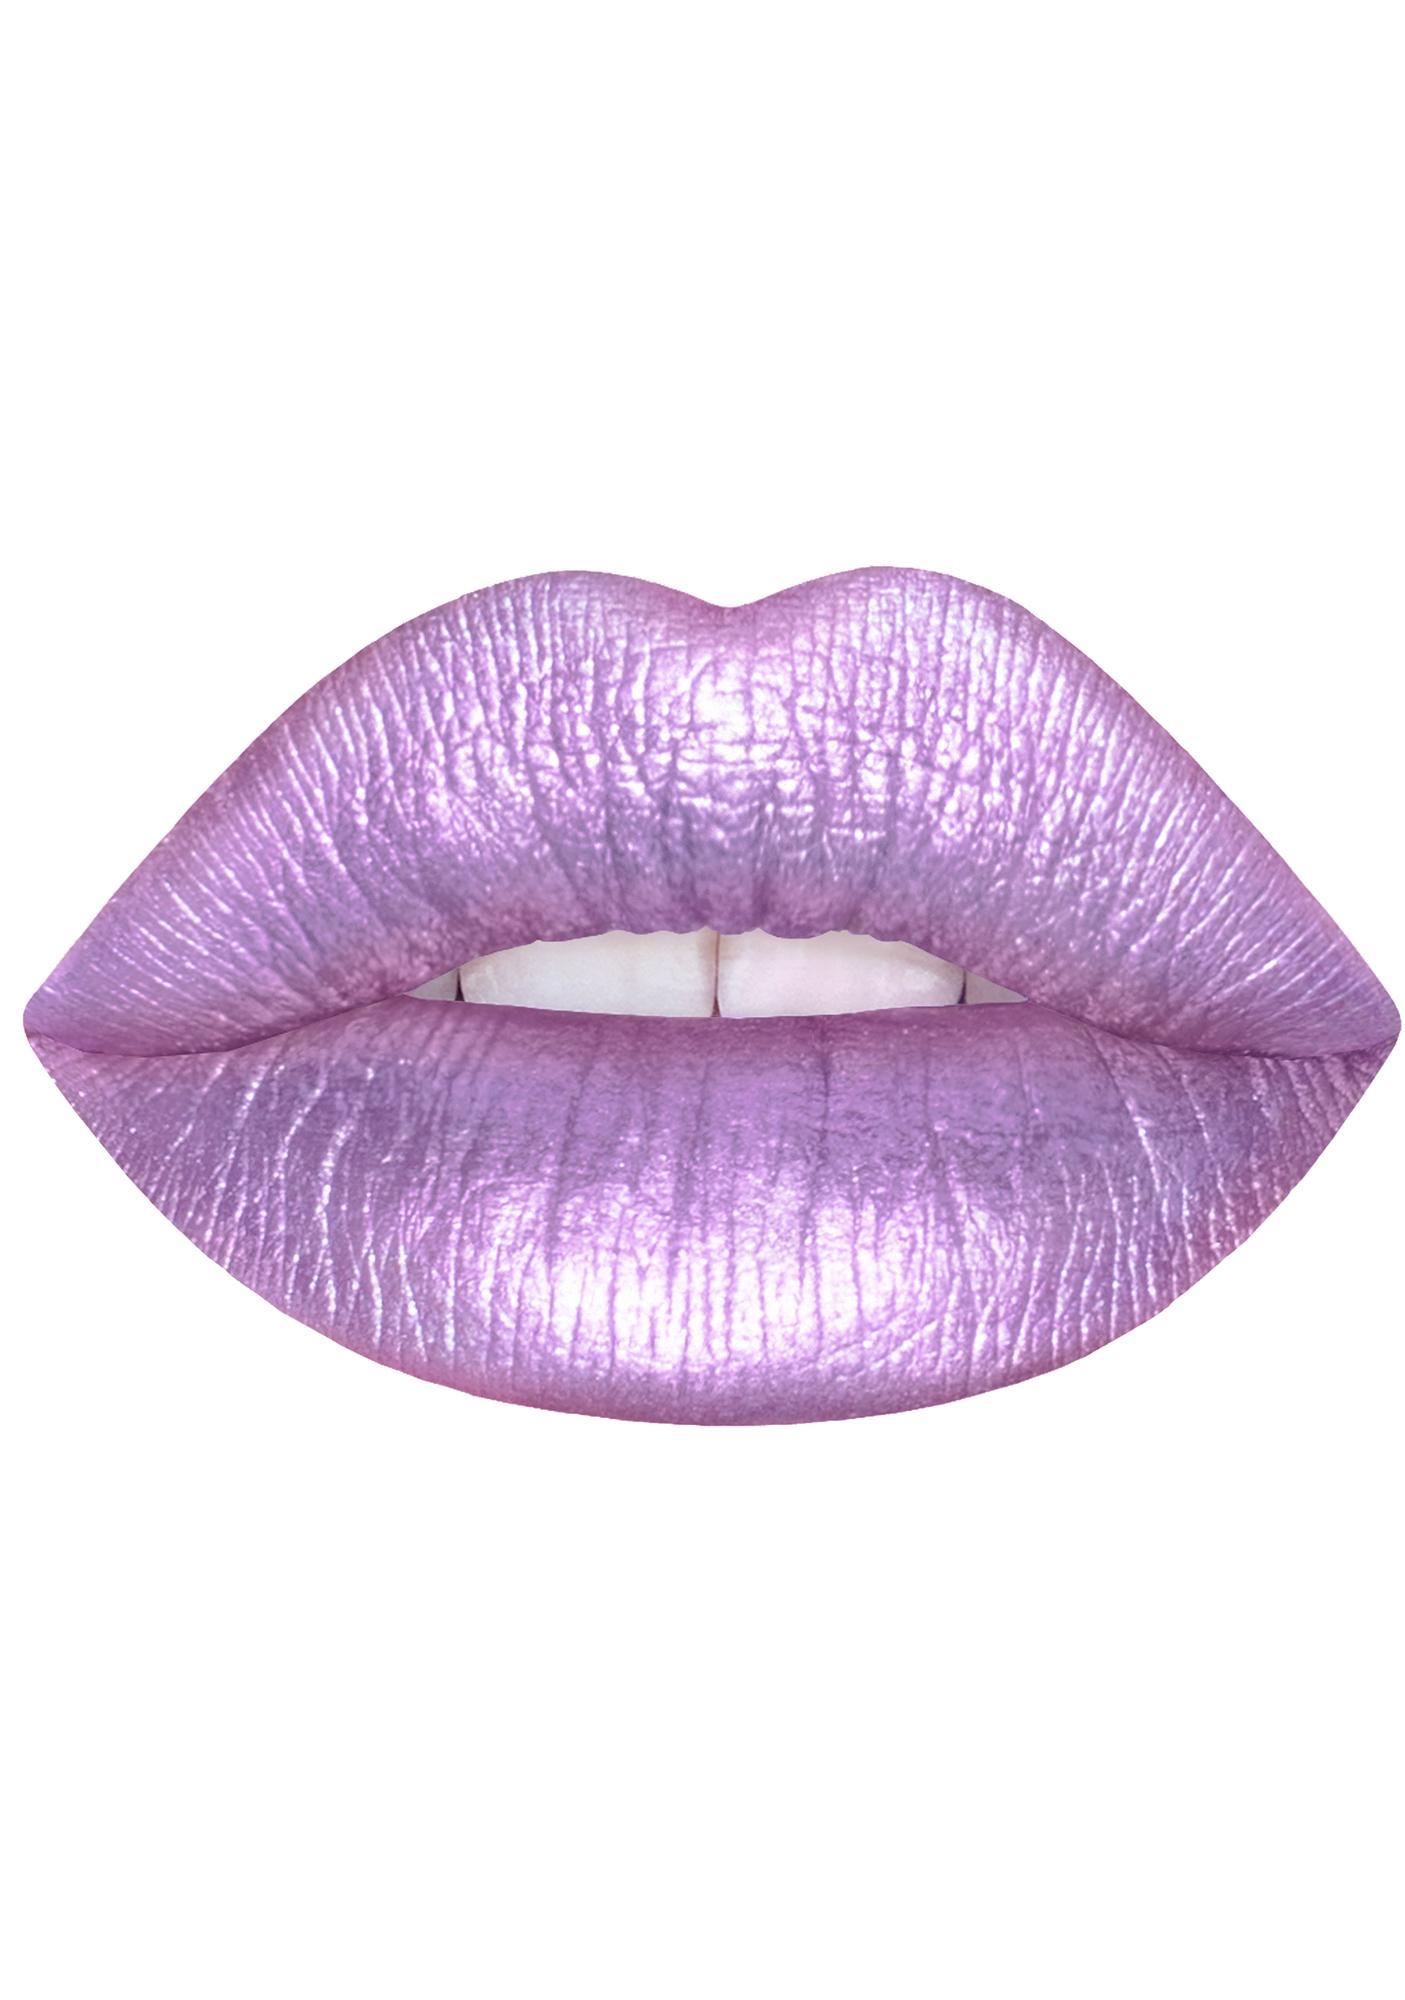 Lime Crime Seashell Bra Metallic Velvetine Liquid Lipstick